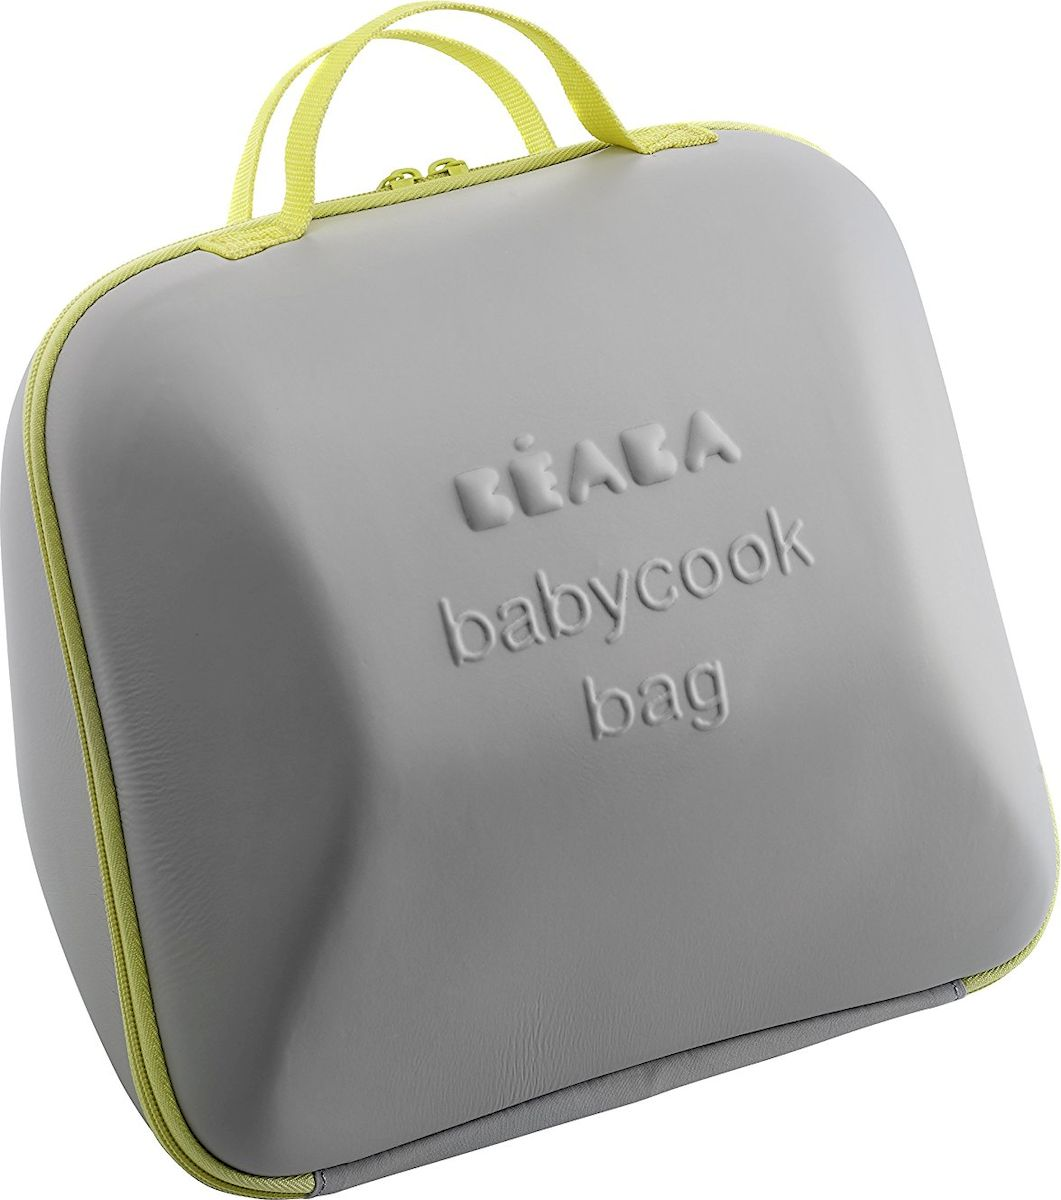 Beaba Сумка для блендера-пароварки цвет серый салатовый